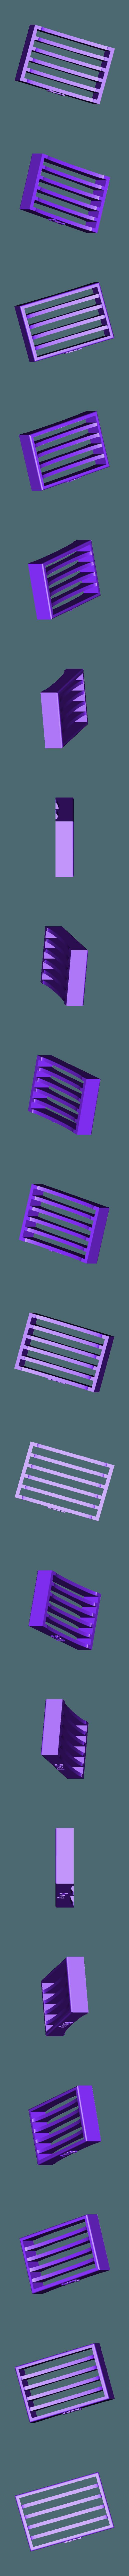 soap_holder_with_Soap_written.stl Download free STL file Soap holder - Porte savon • 3D printing design, MatFeex